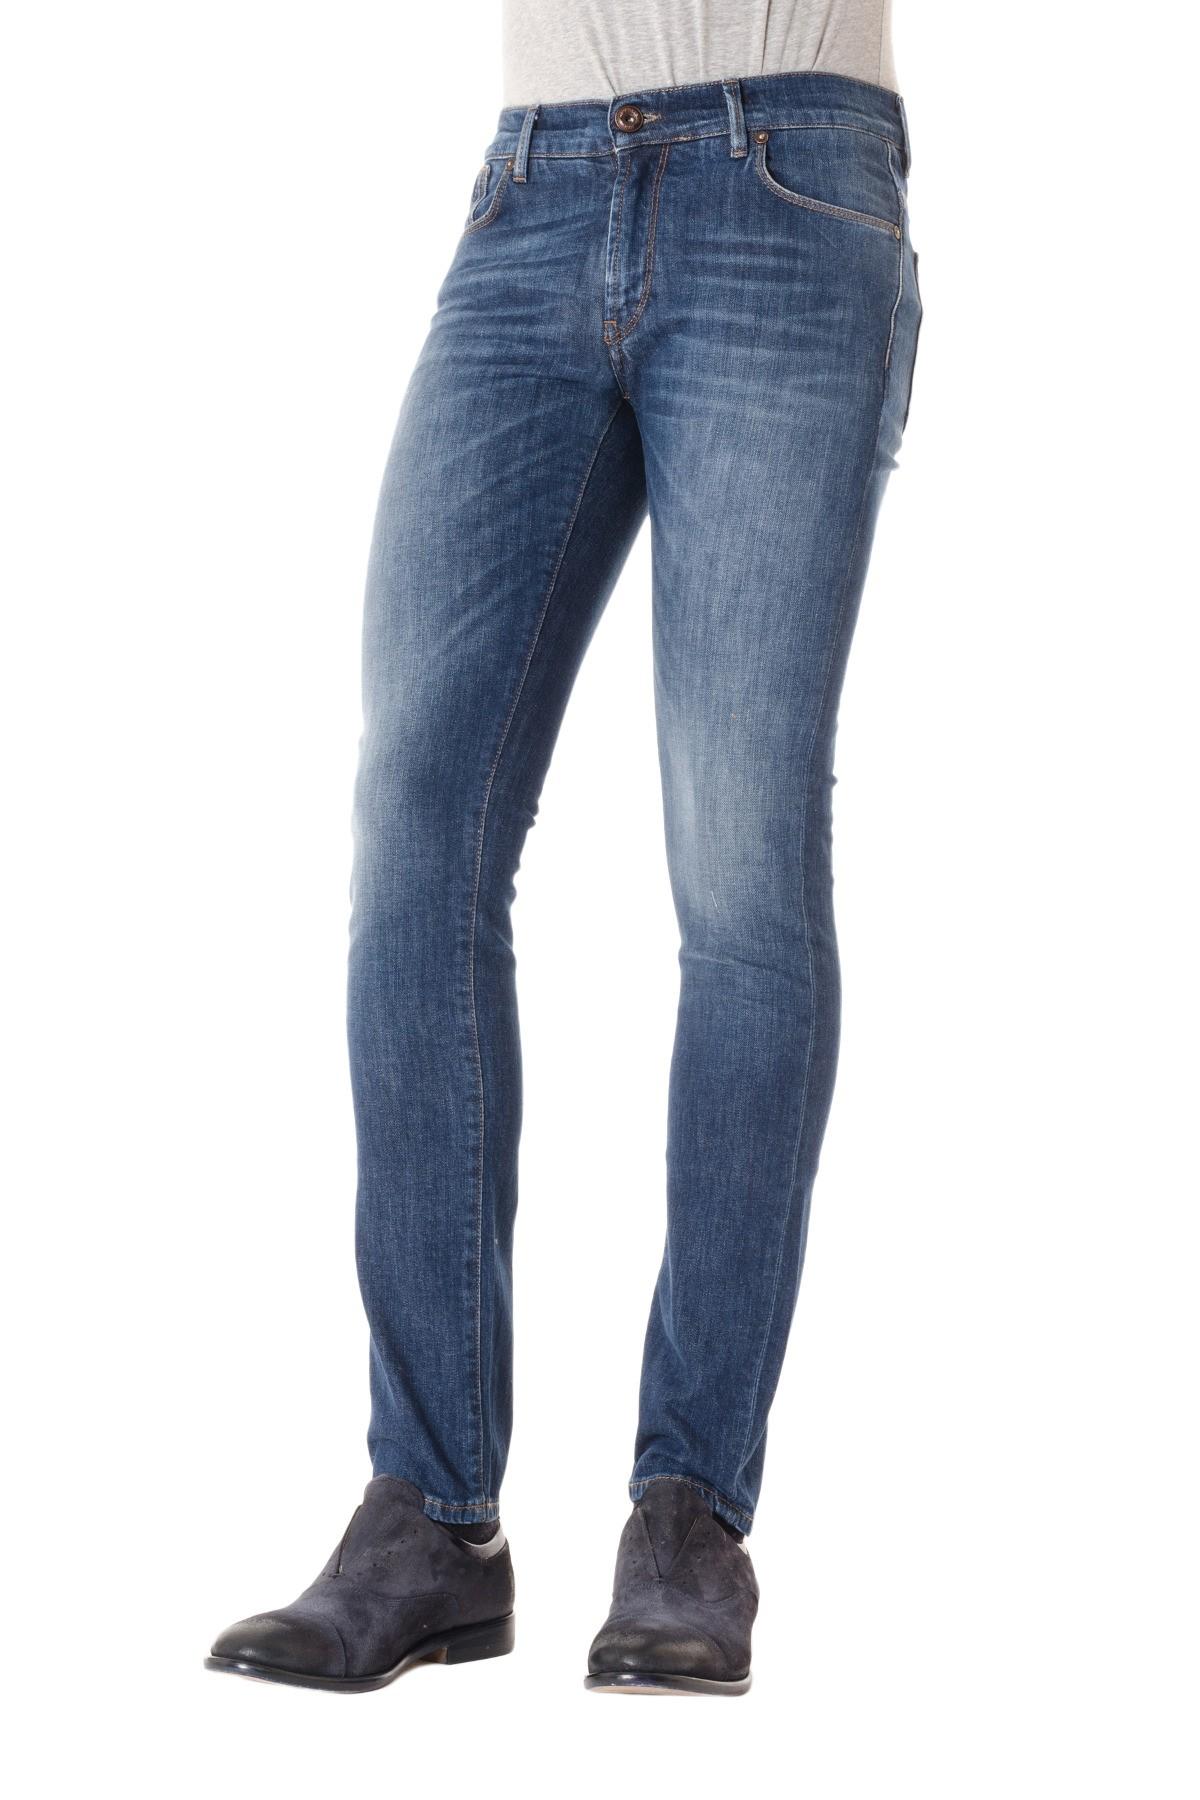 Jeans Denim Colore Blu Super Slim Fit Jeckerson P E 16 Rione Fontana